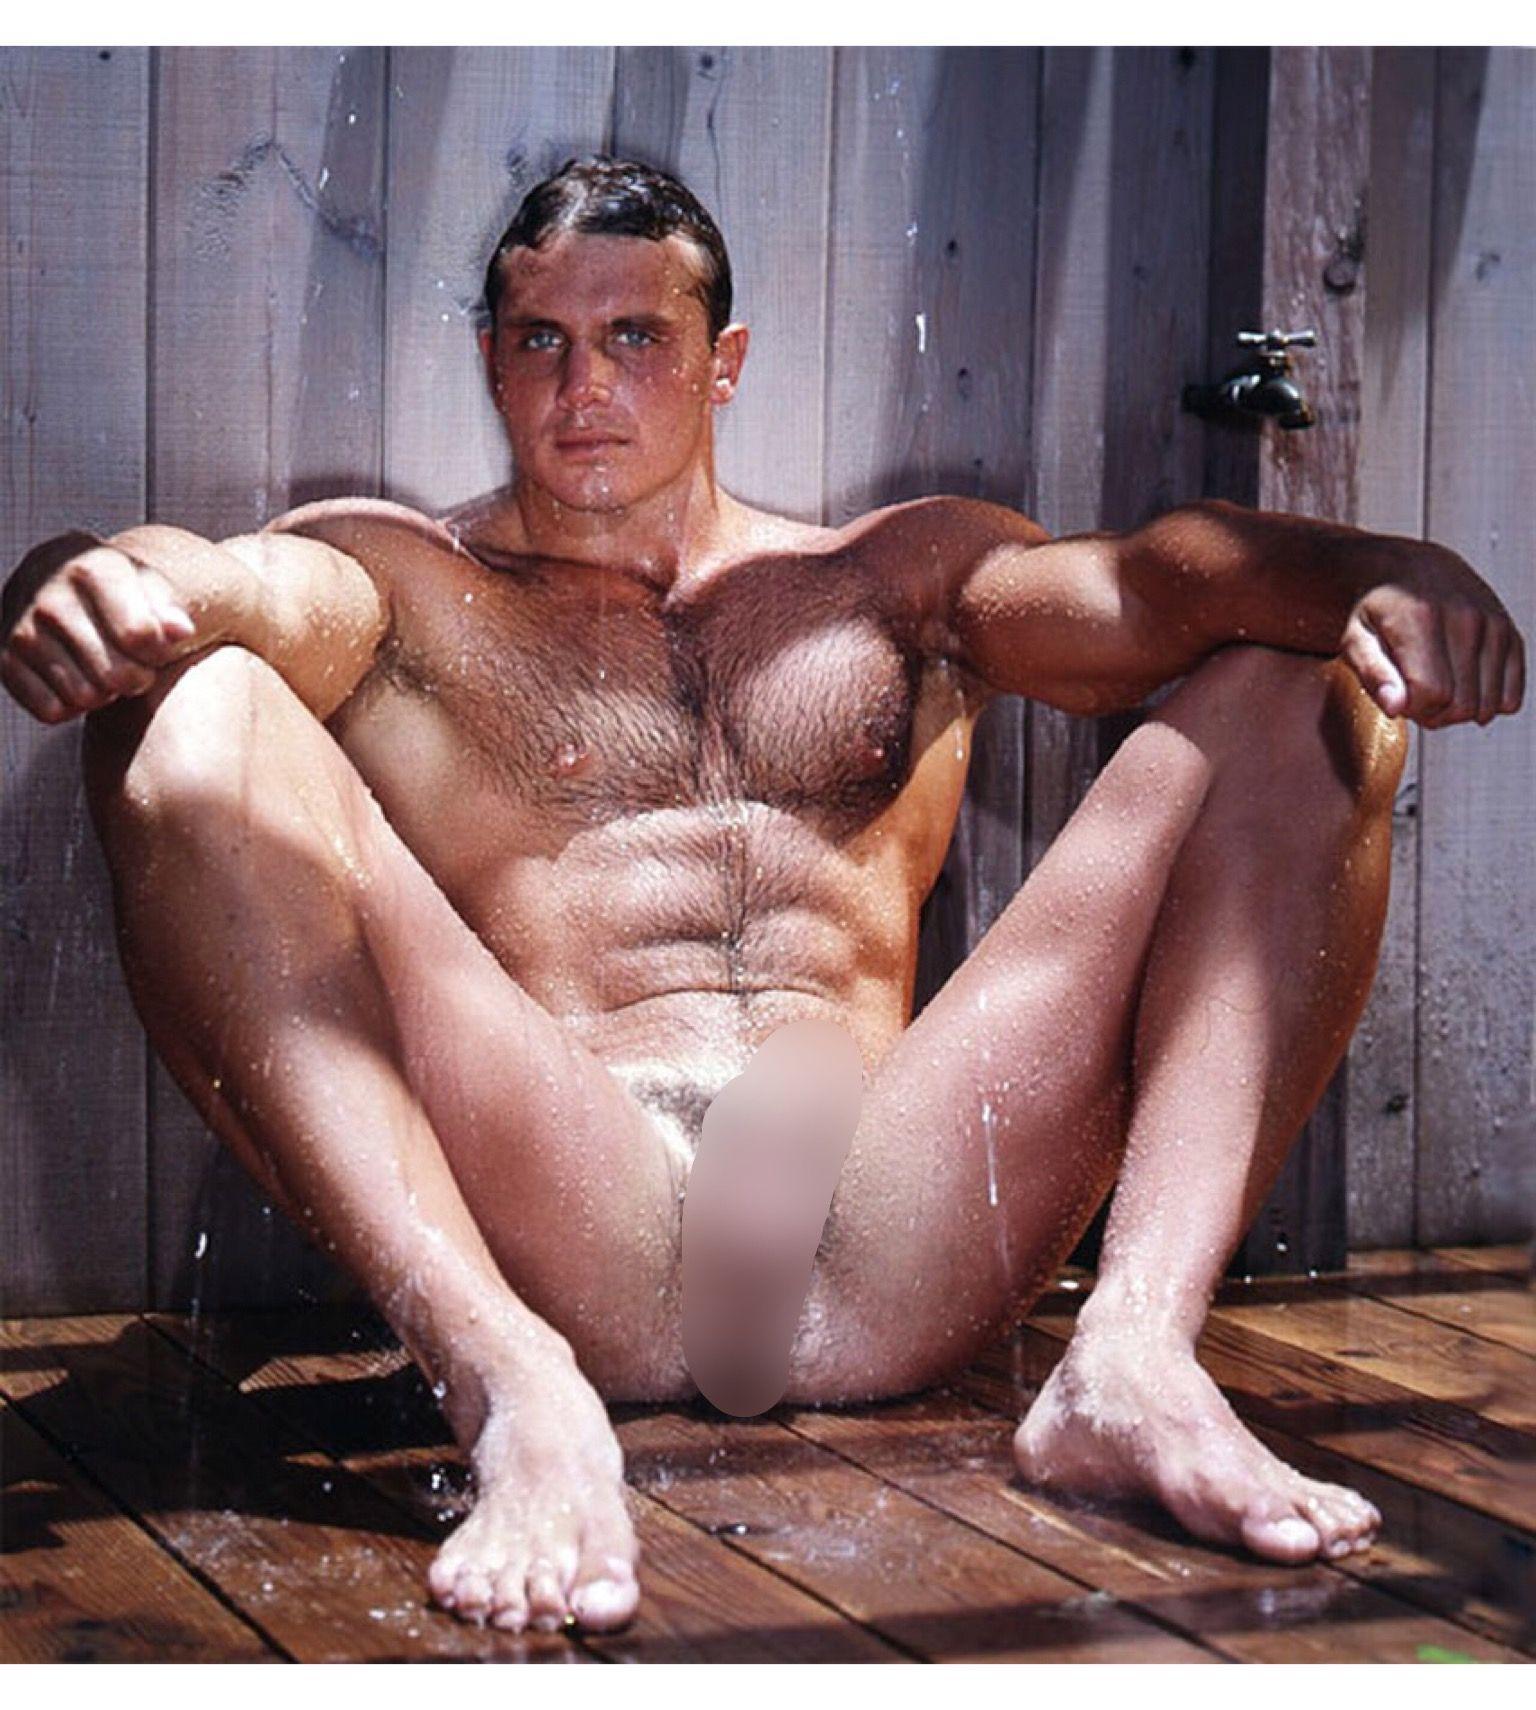 John Pruitt, Colt, Muscle, Blonde, Shower, Hairy, Hunk -5687